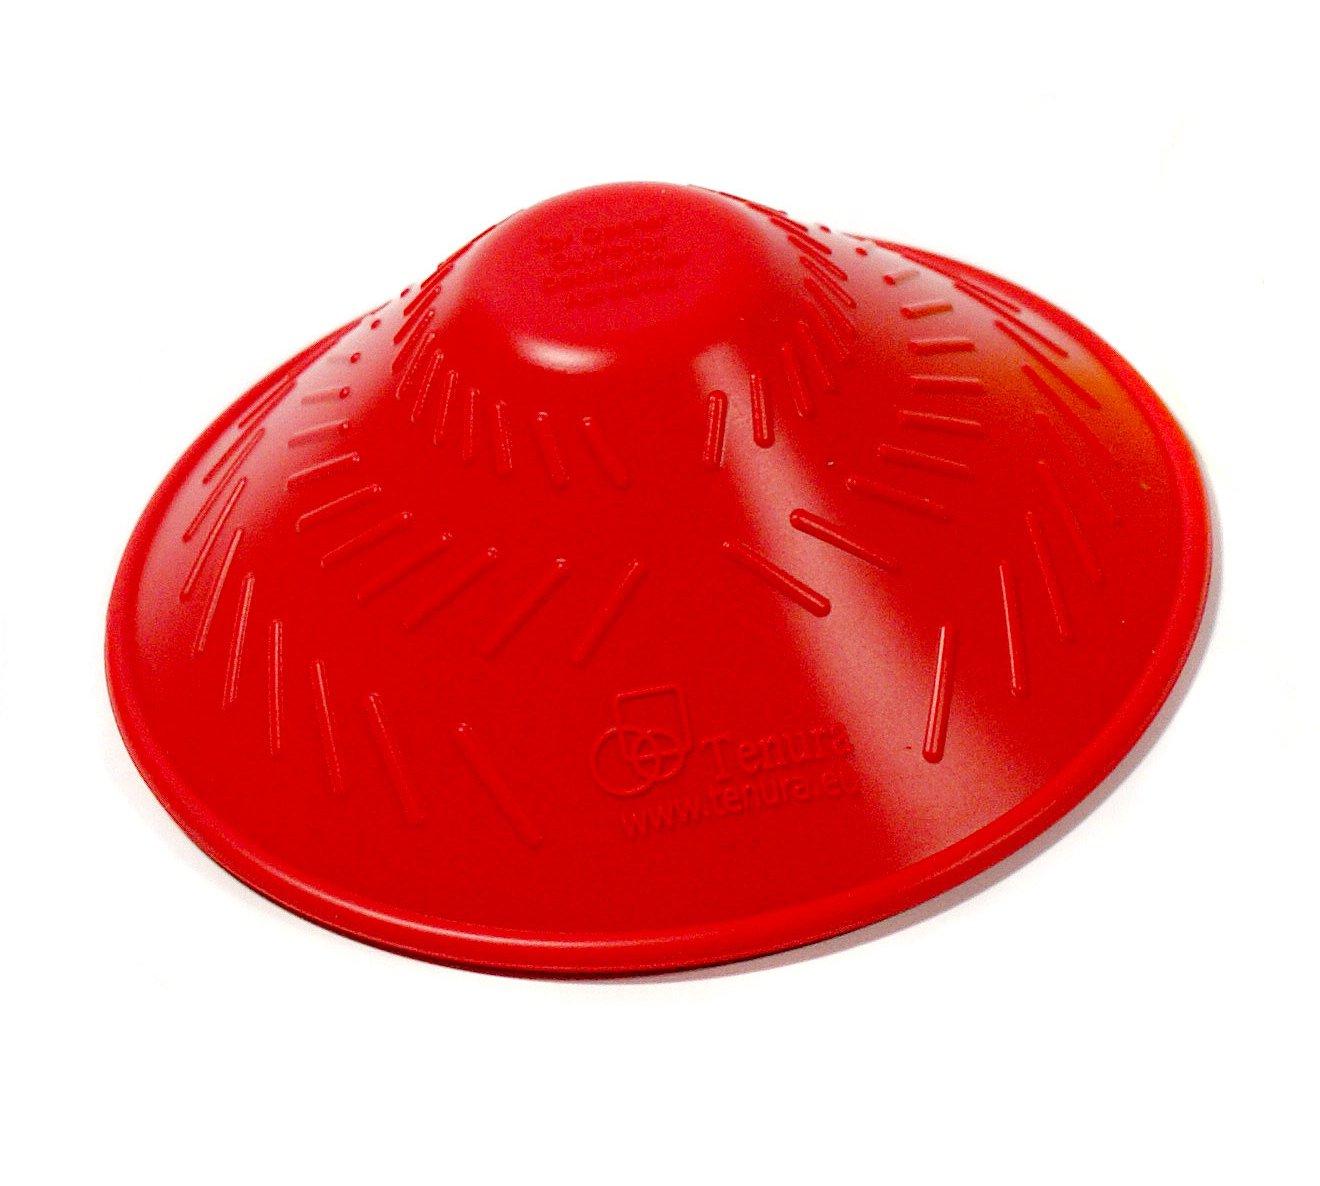 Tenura 75371-0001 Red Silicone Jar Opener, 4-5/8